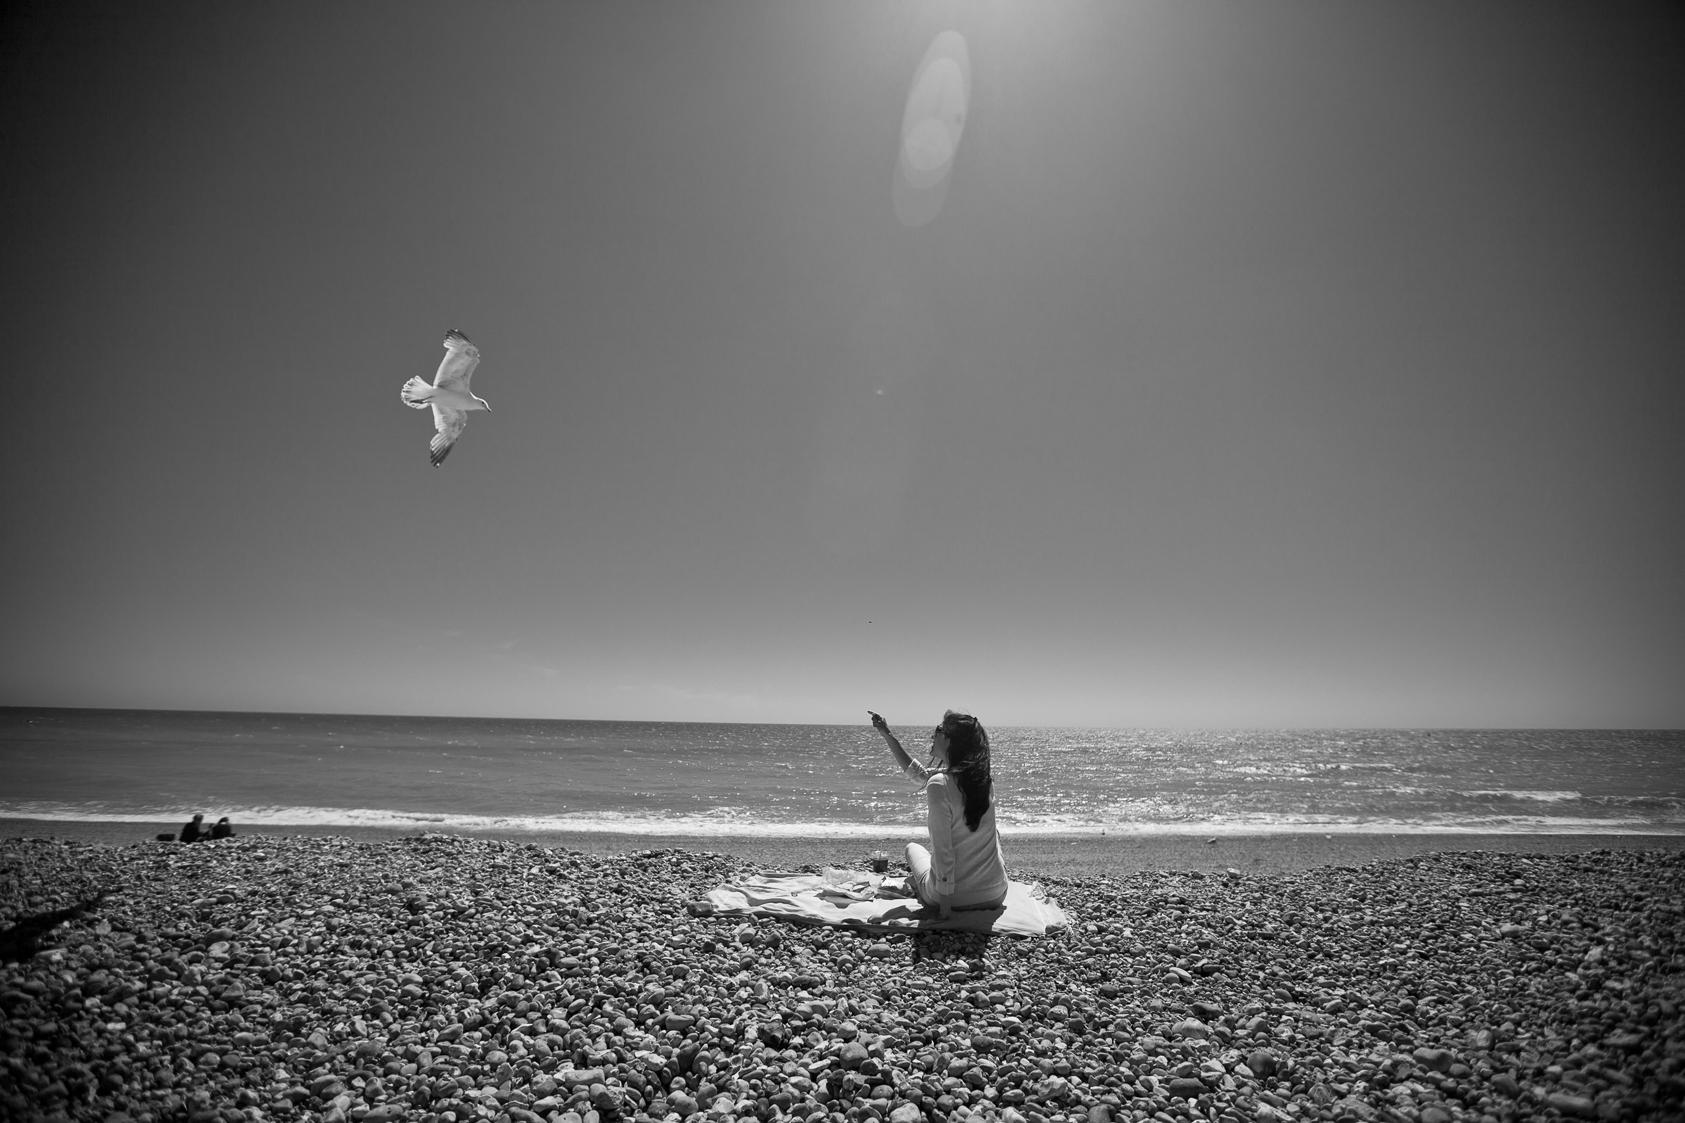 Brighton2014_dvlpd-4920.jpg